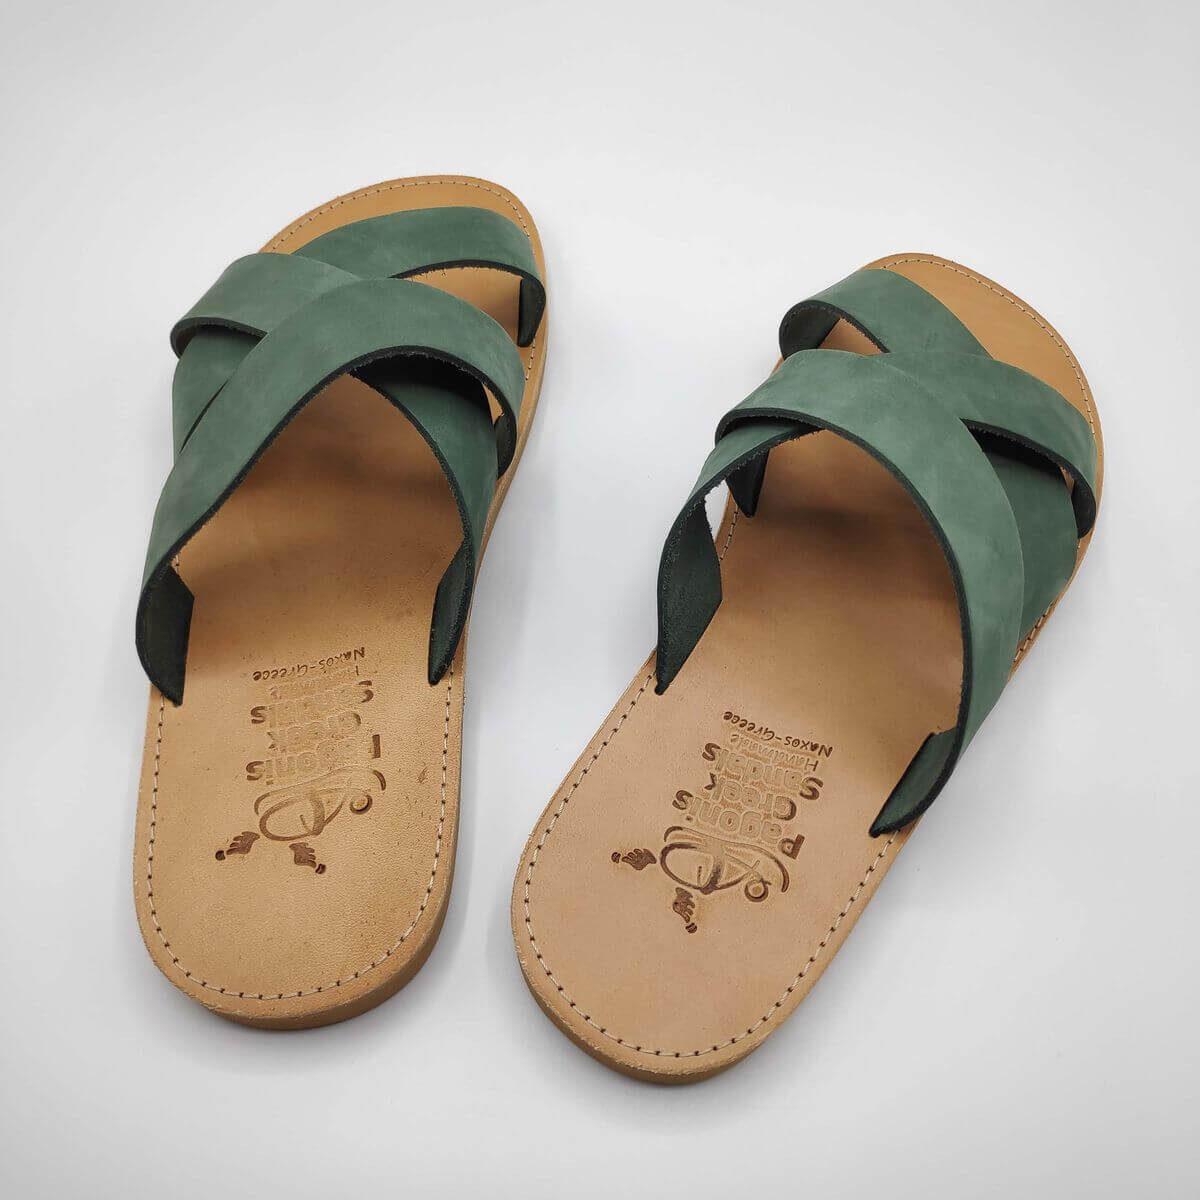 leather sandals for men green three straps criss cross back view - Avithos Men